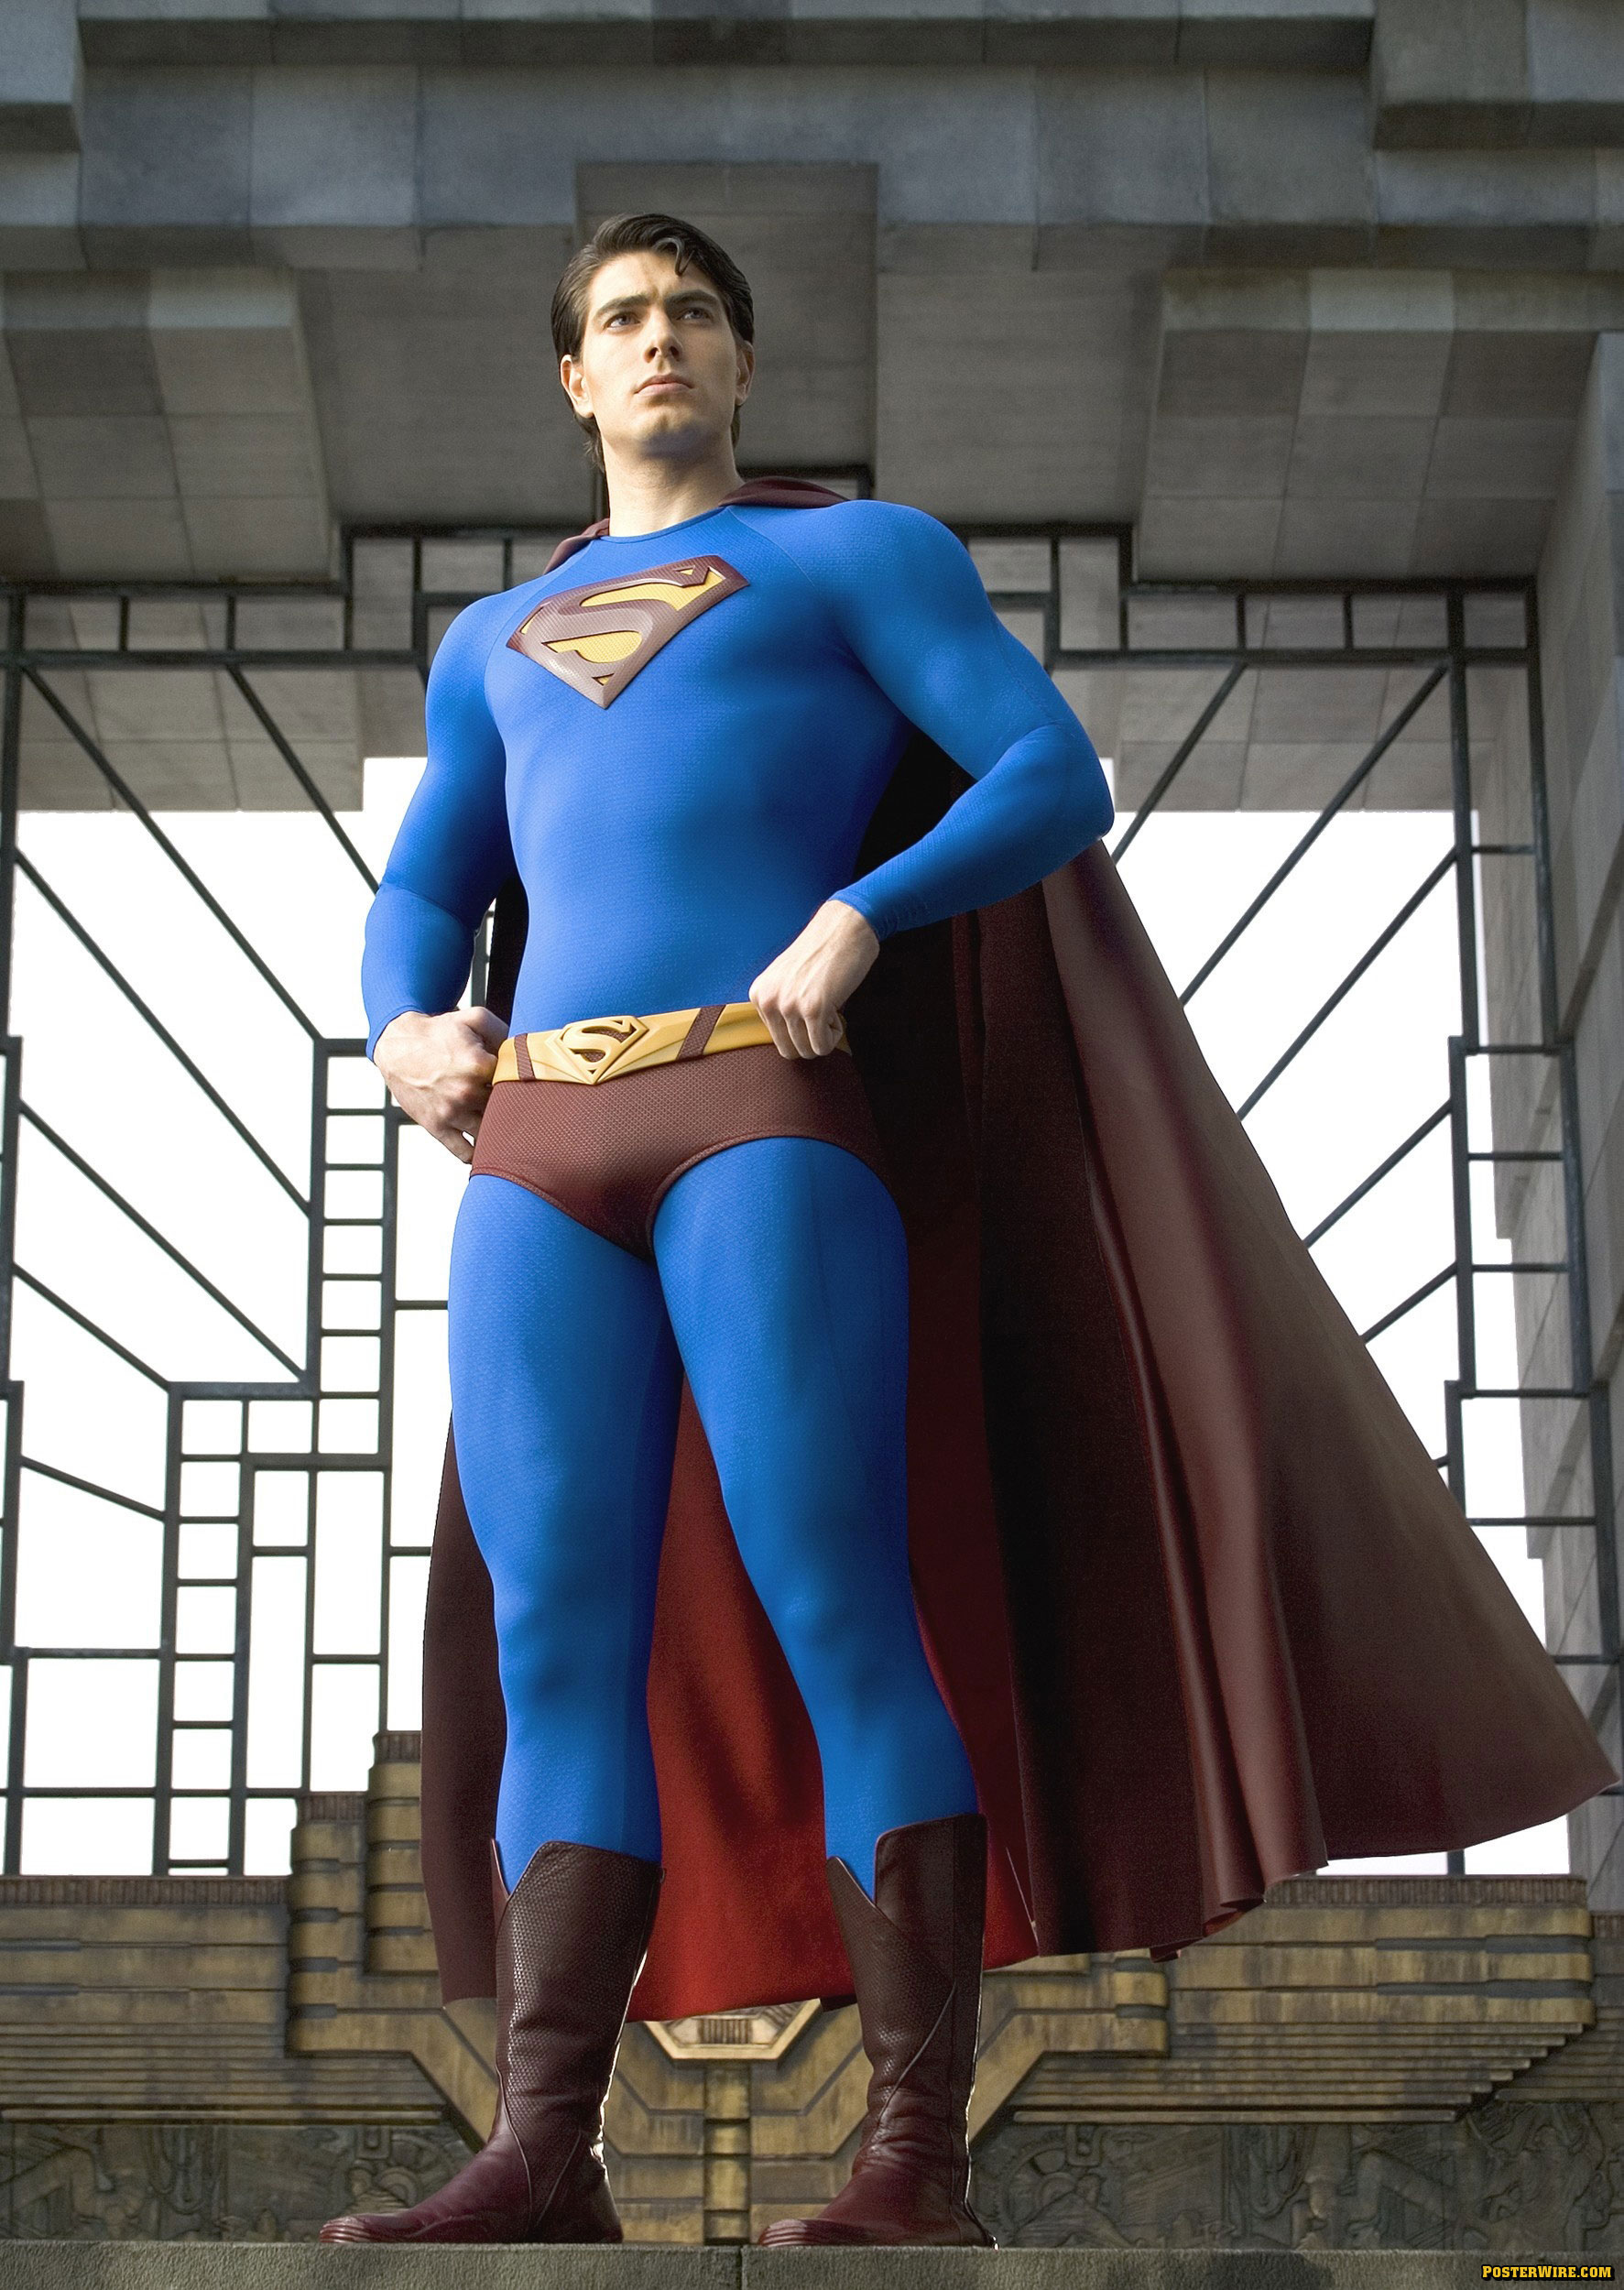 CapedWonder Superman Imagery. Christopher Reeve Superman Brandon routh superman photos